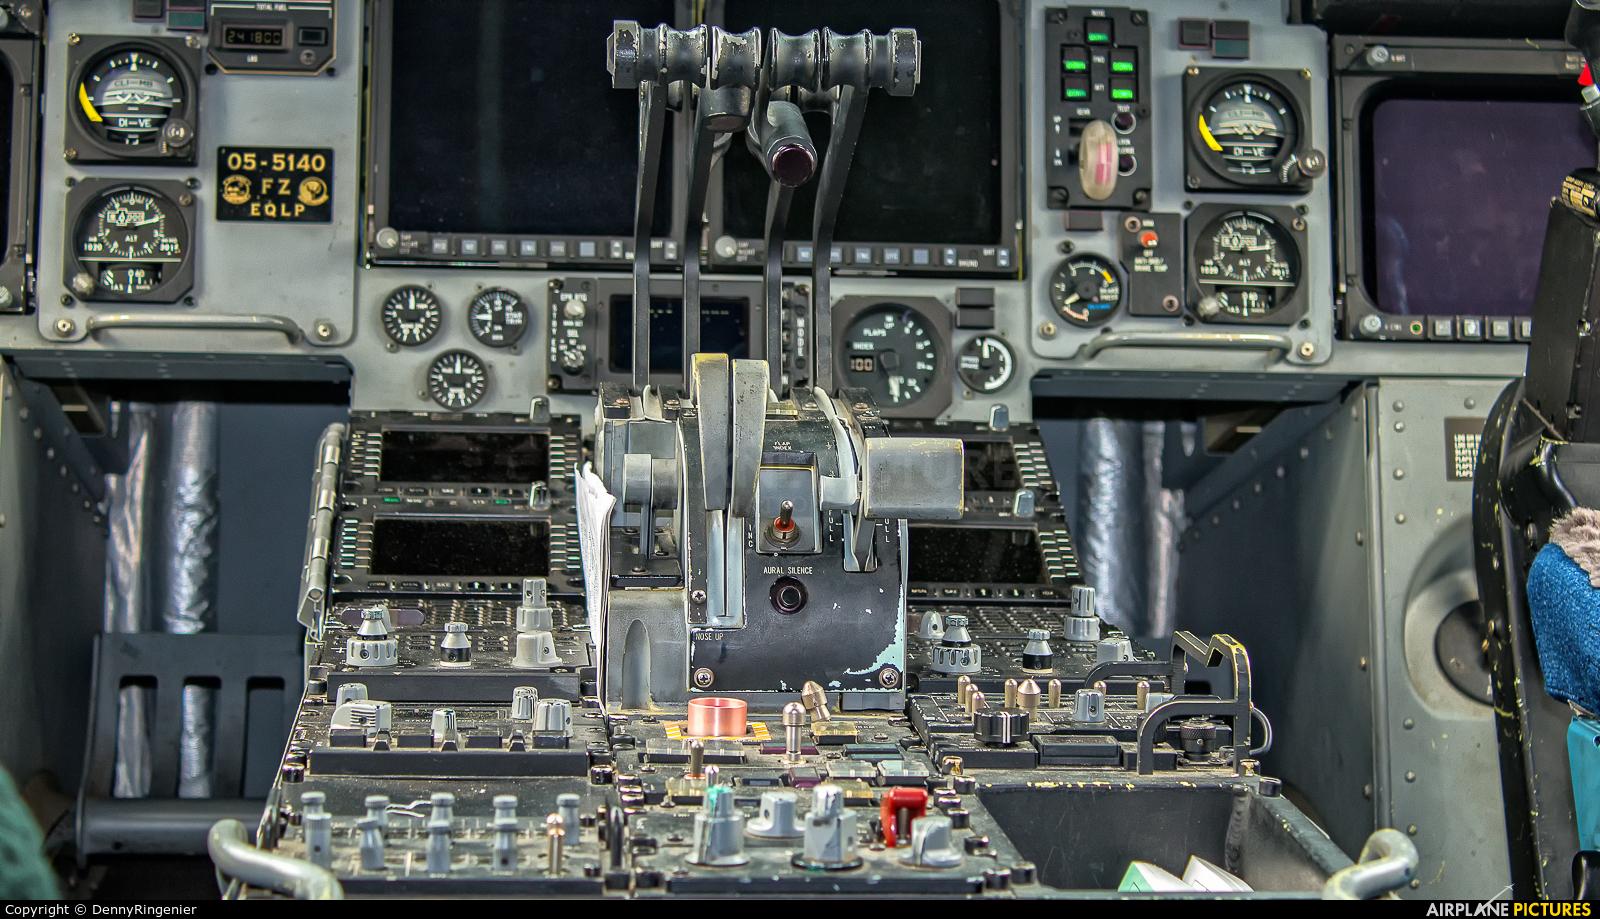 USA - Air Force AFRC 05-5140 aircraft at Leeuwarden